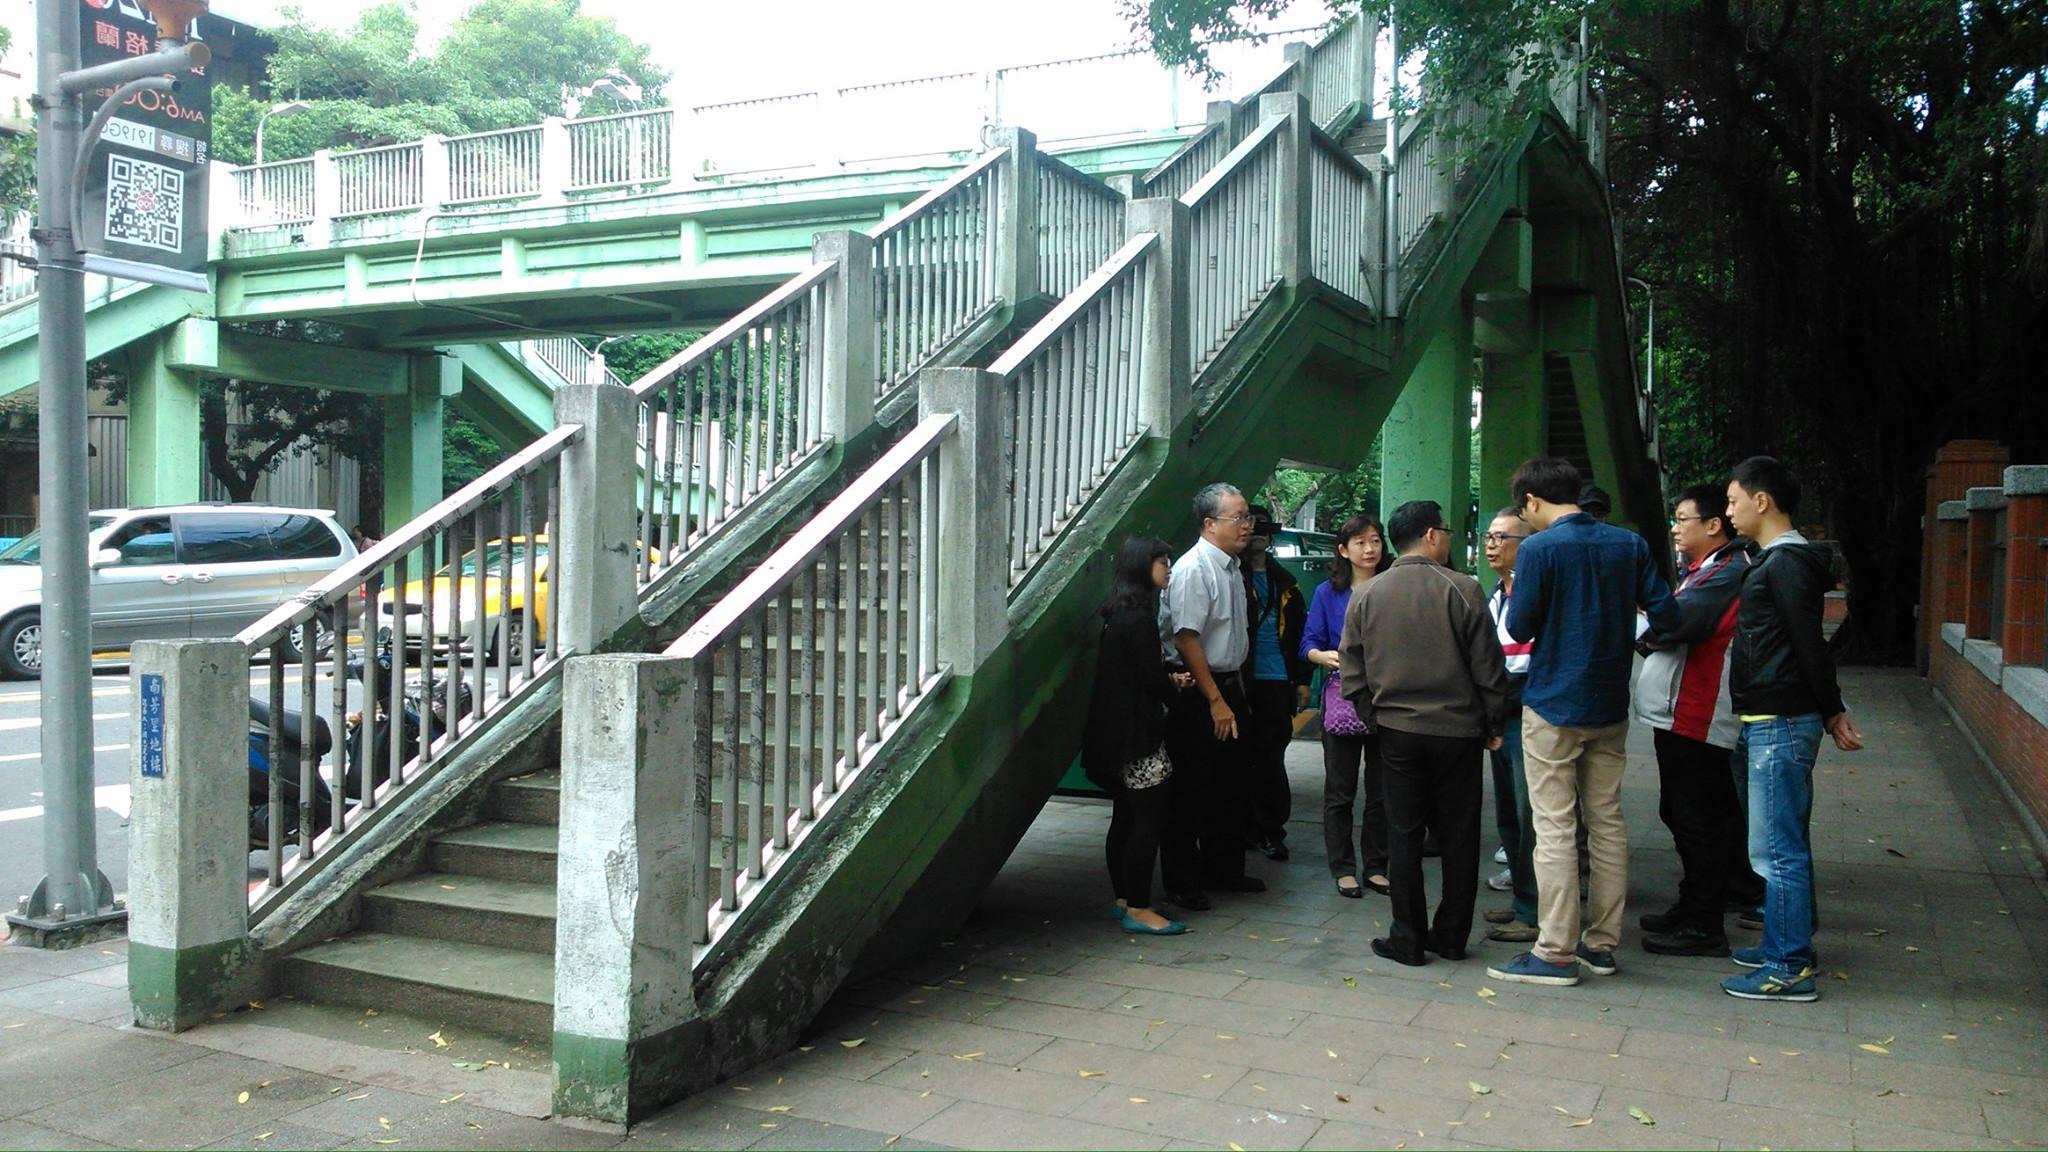 Local residents gather to urge historic preservation. Photo via Yi Chiu at Taipei Walking Tour